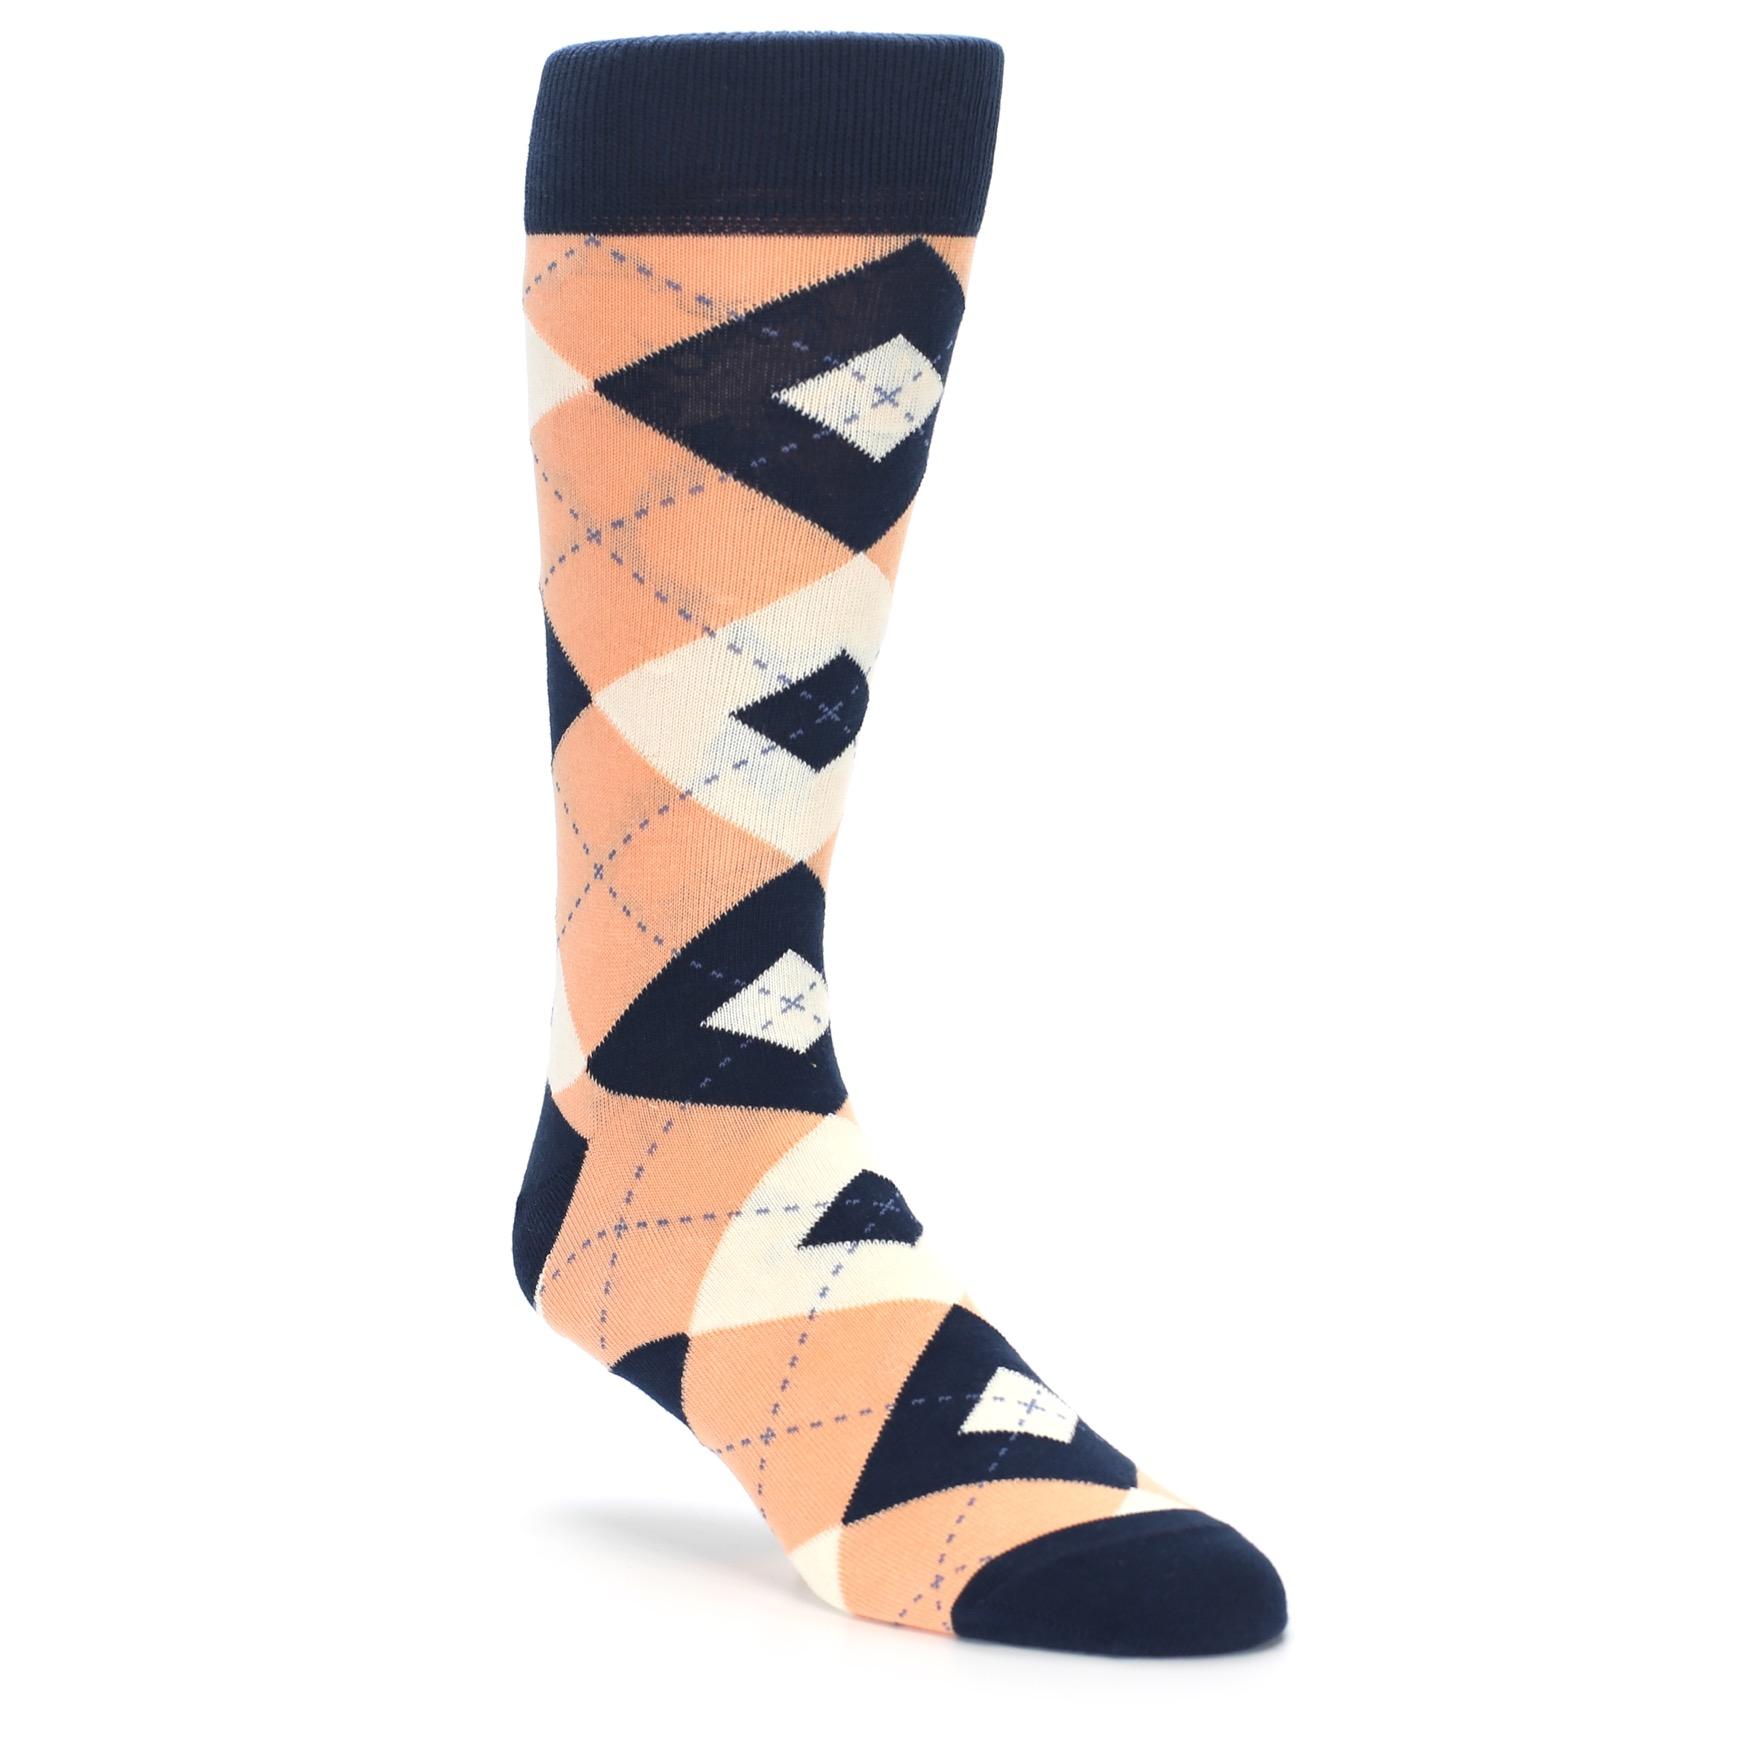 Peach Navy Argyle Wedding Groomsmen Men's Dress Socks